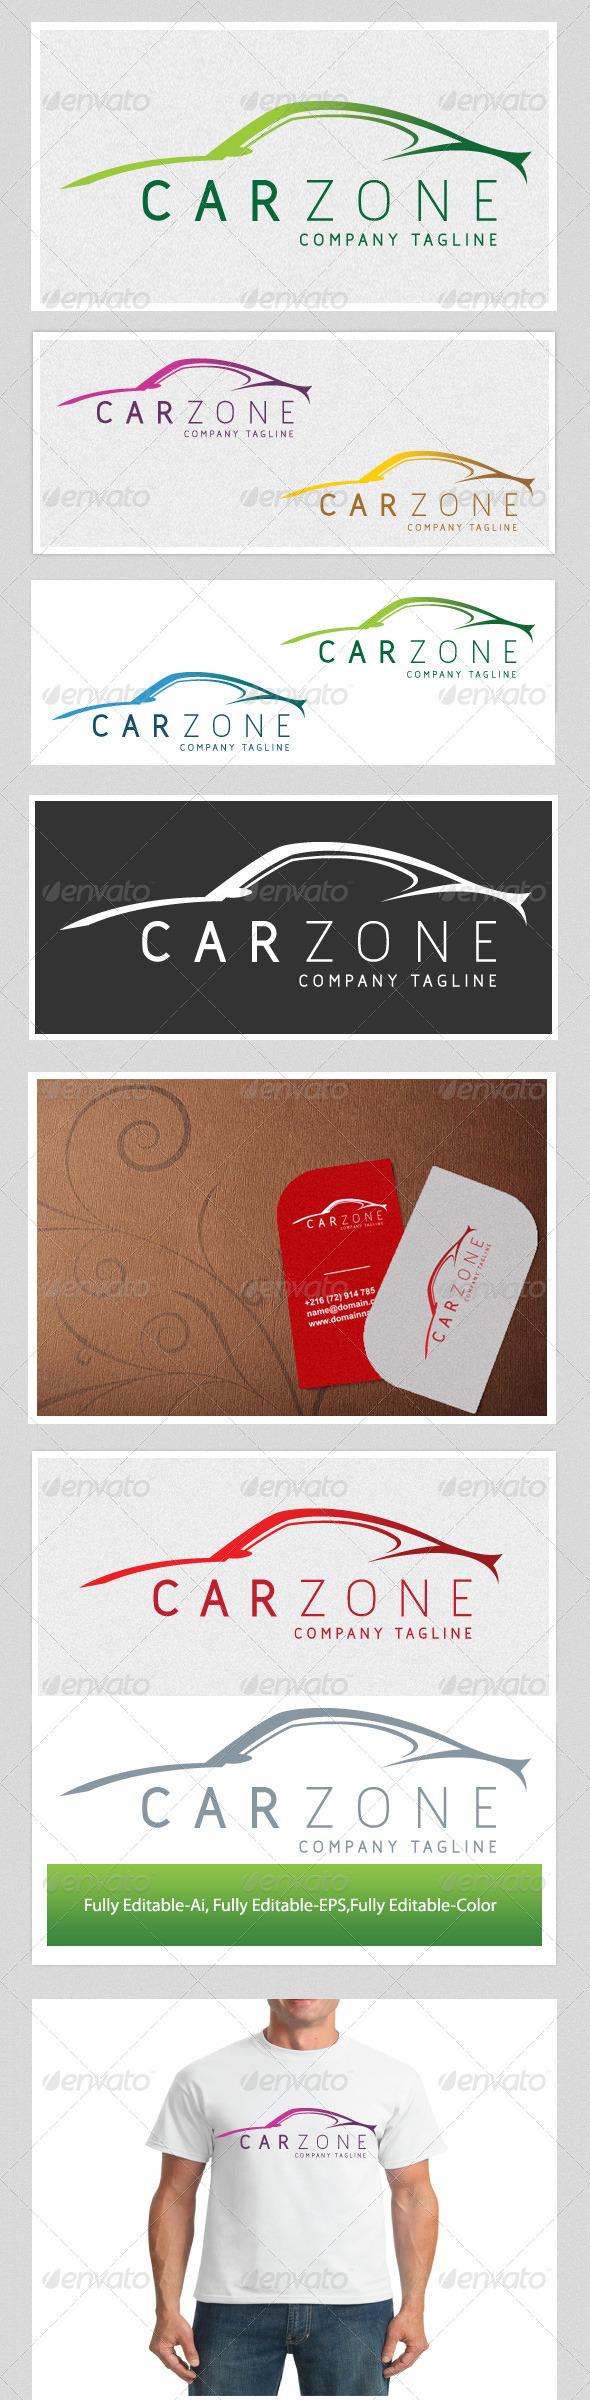 Car Zone - Vector Abstract